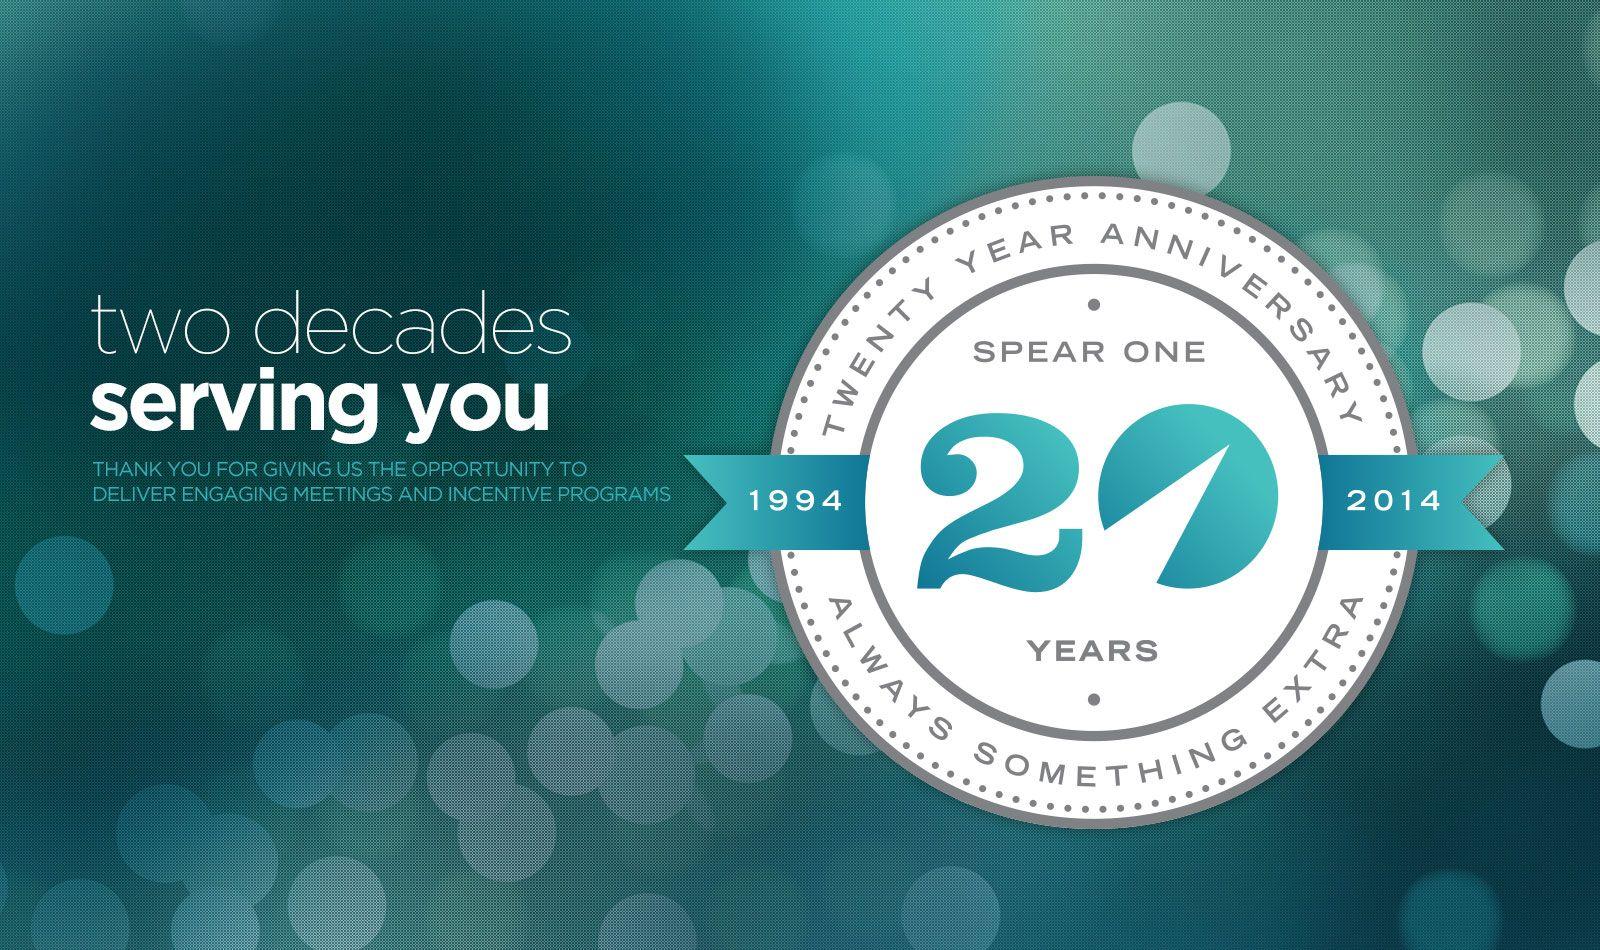 Related Image Corporate Anniversary Pinterest